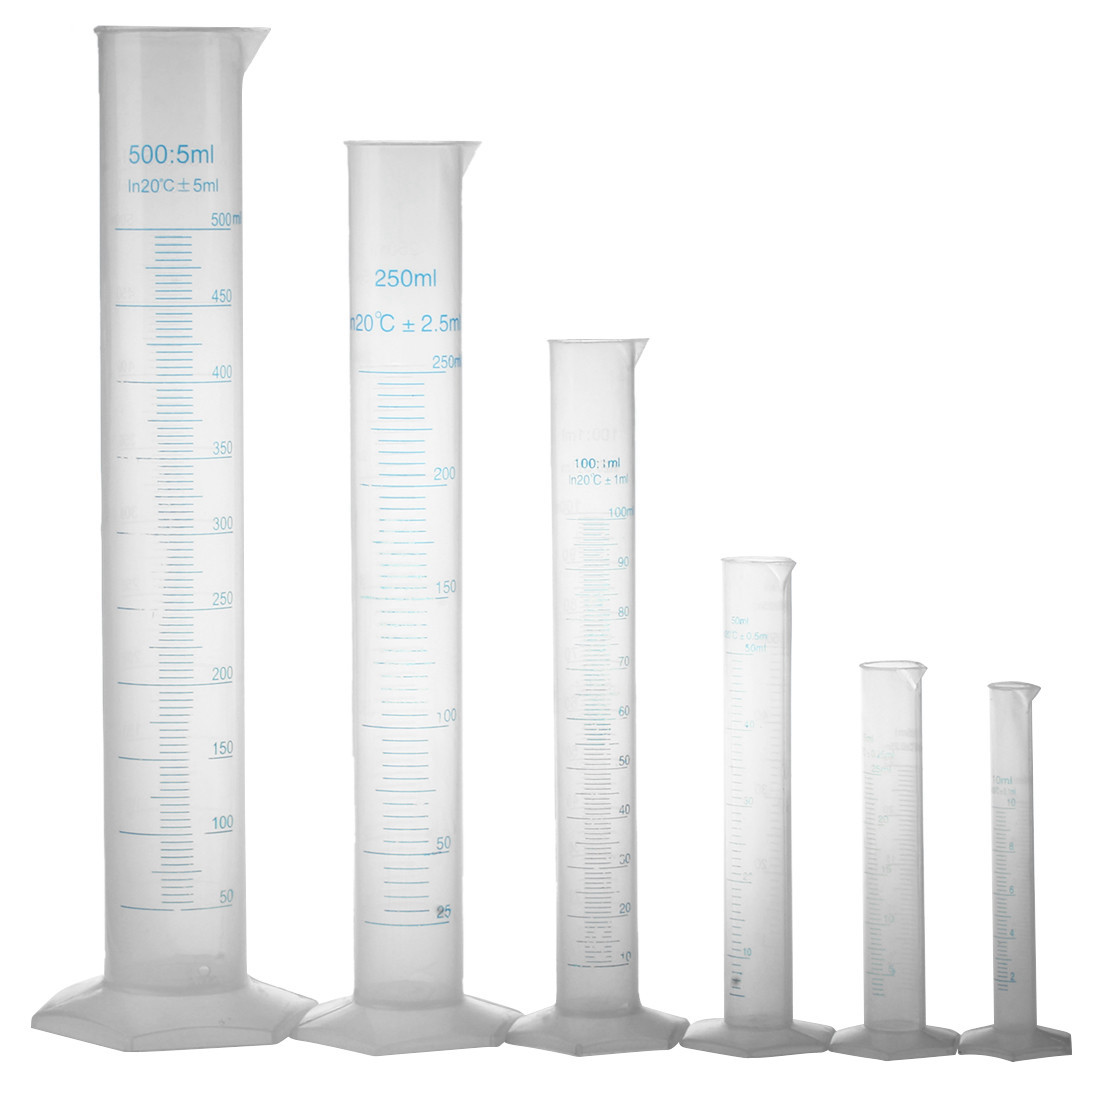 10 25 50 100 250 500ml Graduated Cylinder To Measure Students Laboratory DIY 6 Pcs